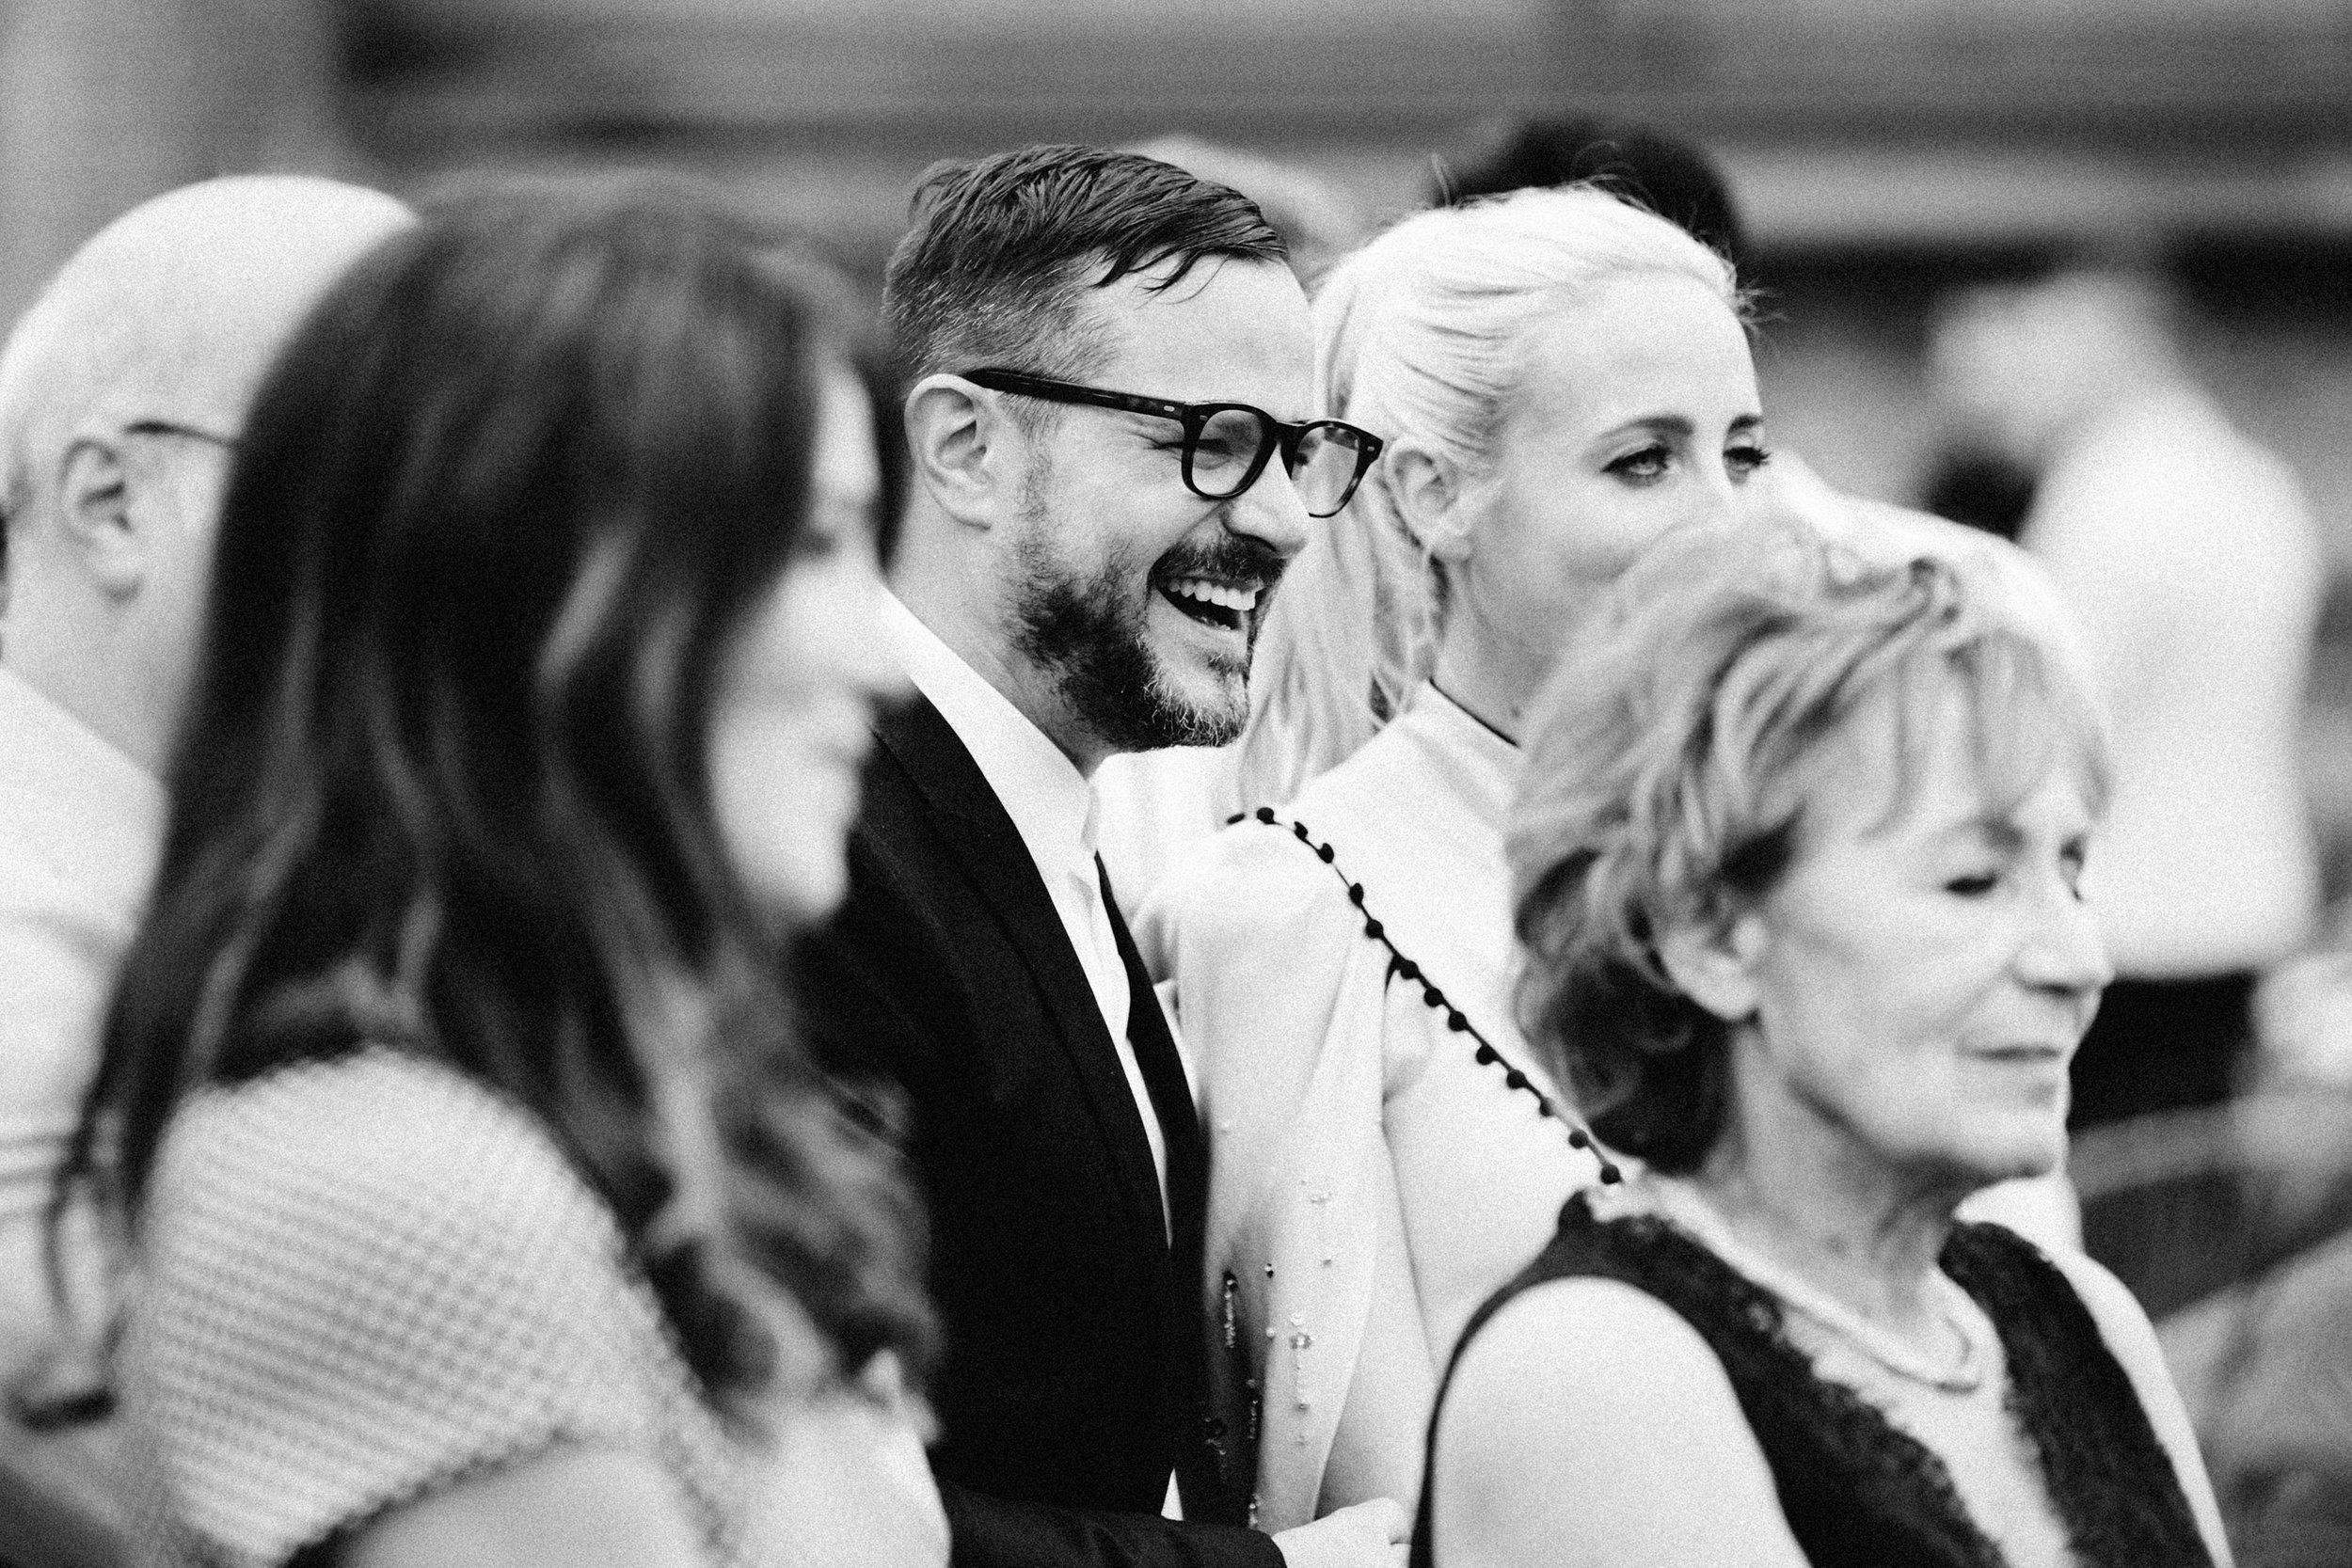 West-London-wedding-party-in-Ladbroke-Grove-Michael-Newington-Gray-47.jpg